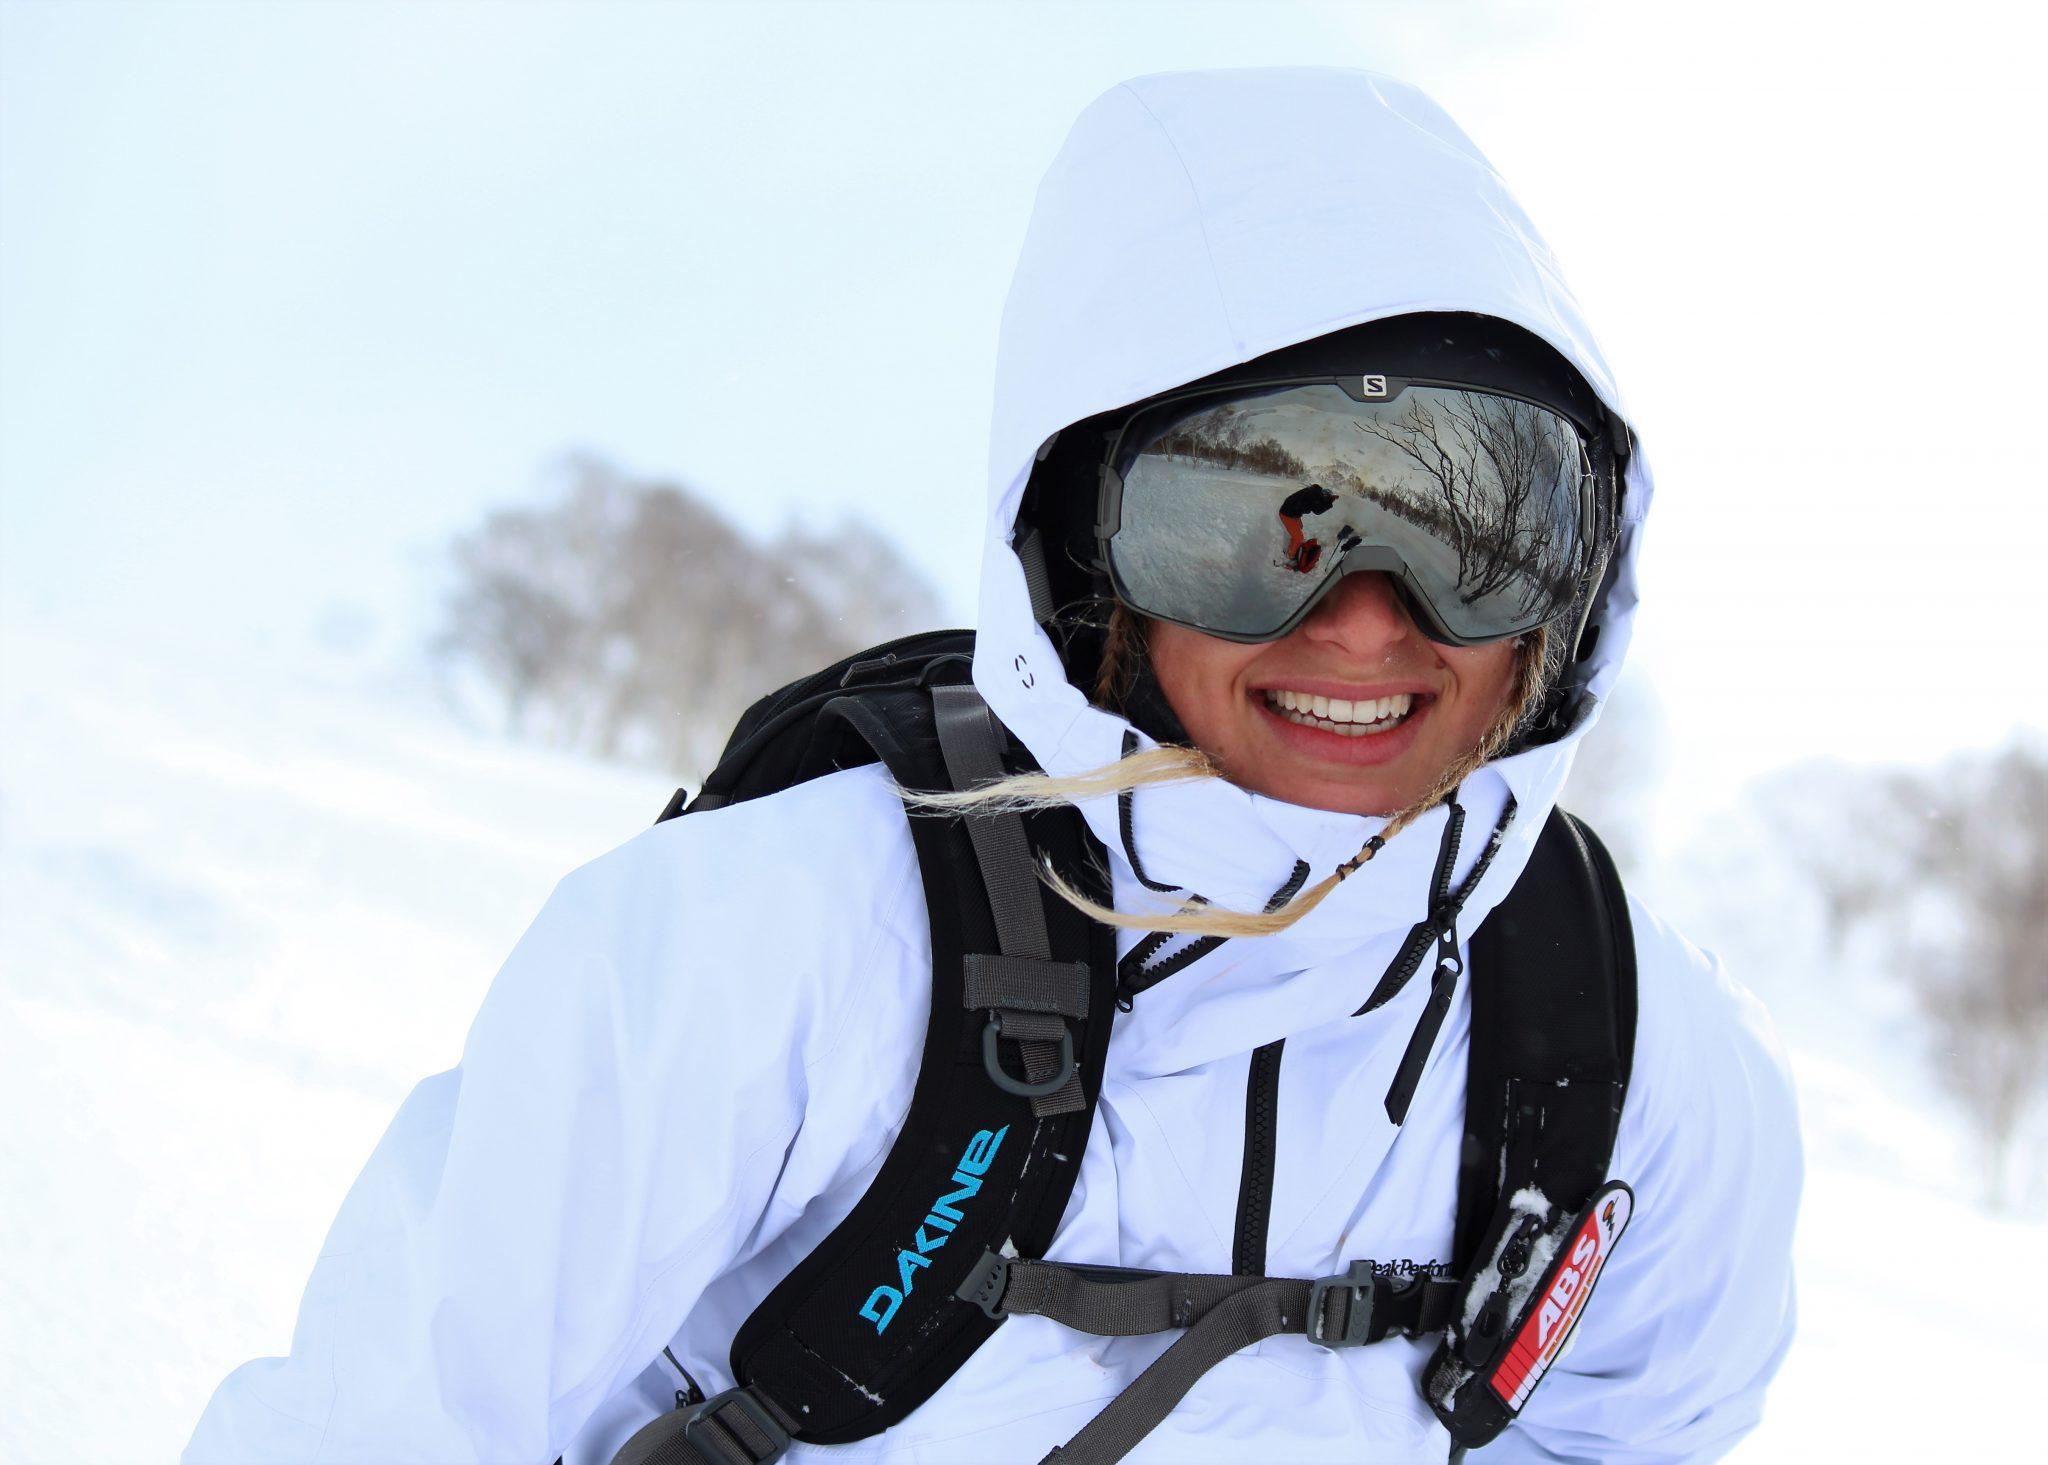 Ski instructor course hakuba valley japan snowminds